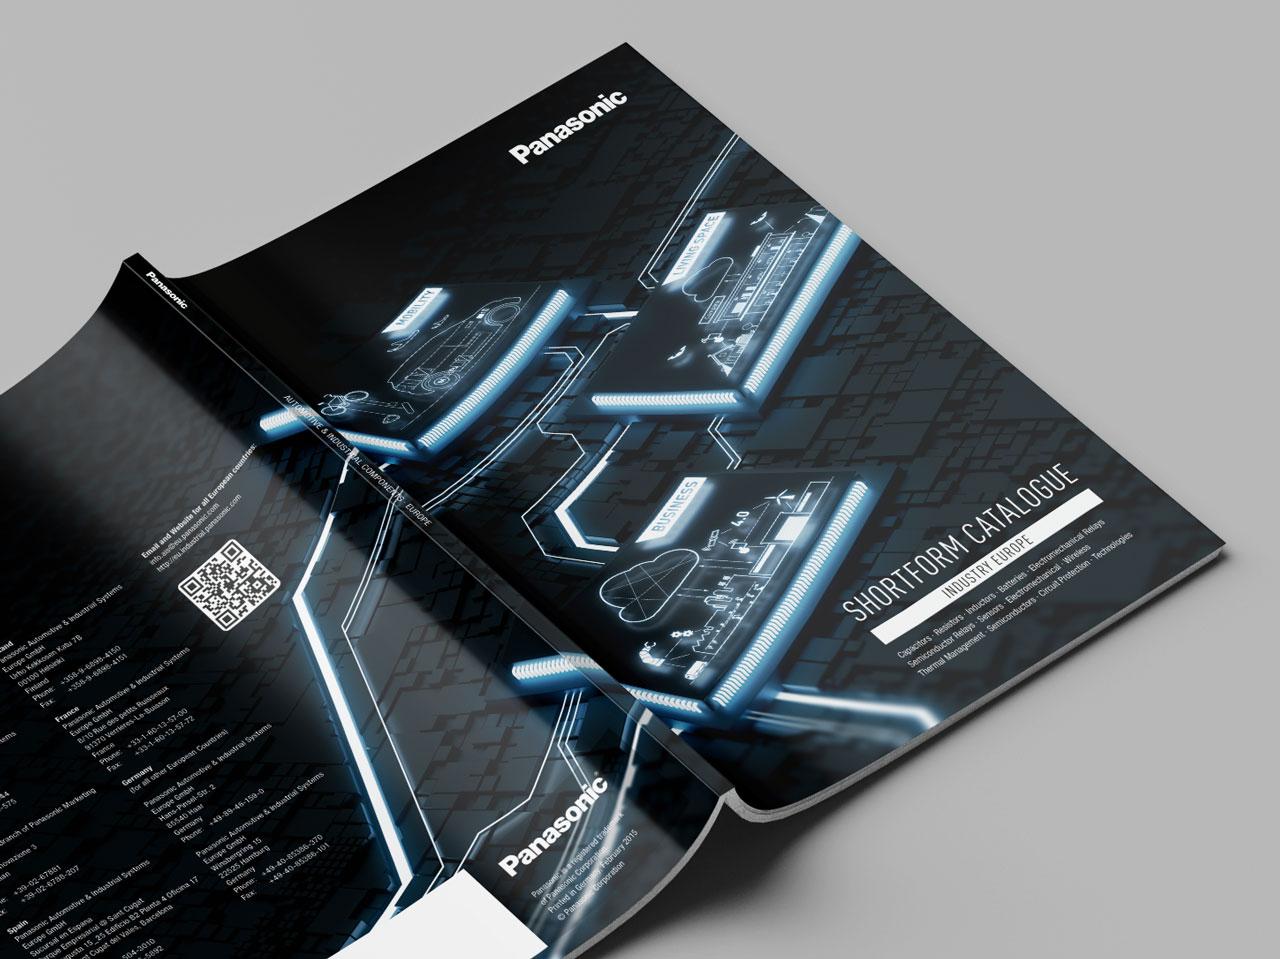 renoarde panasonic print 006